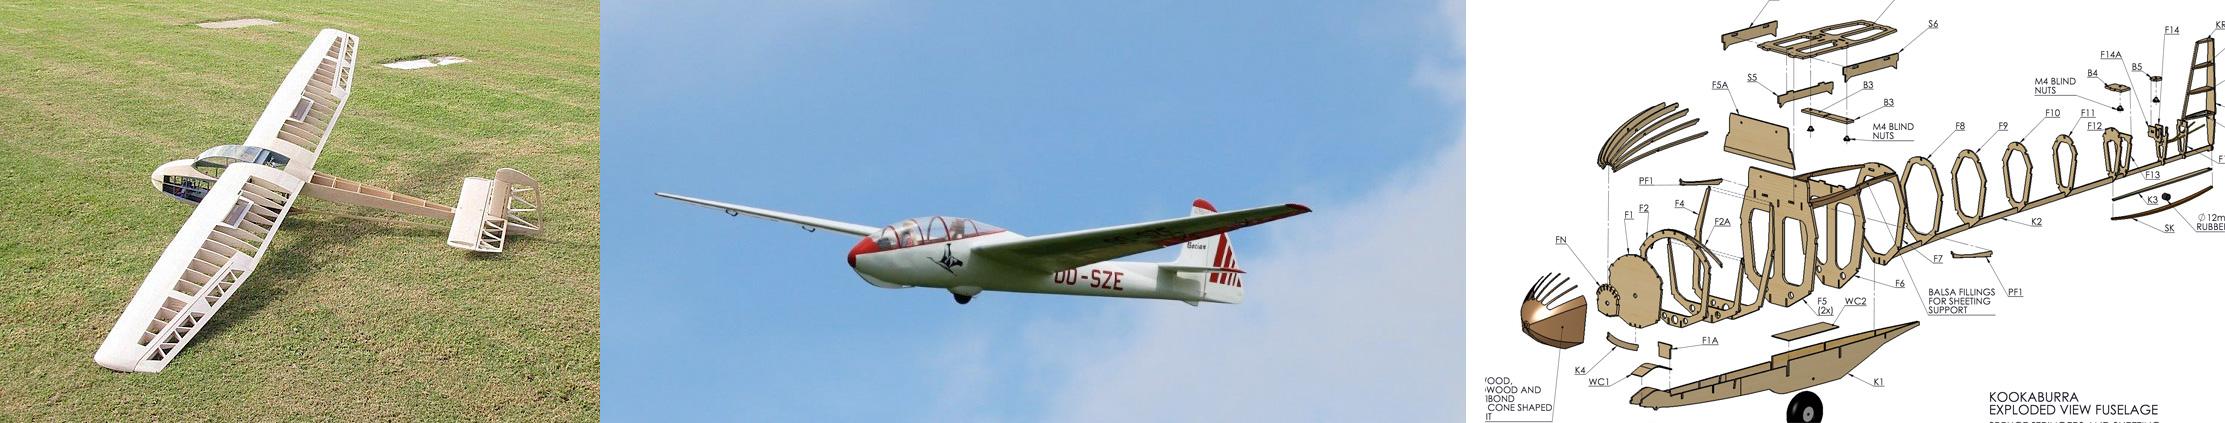 Bauplan Minimoa Modellbau Modellbauplan Segelflug